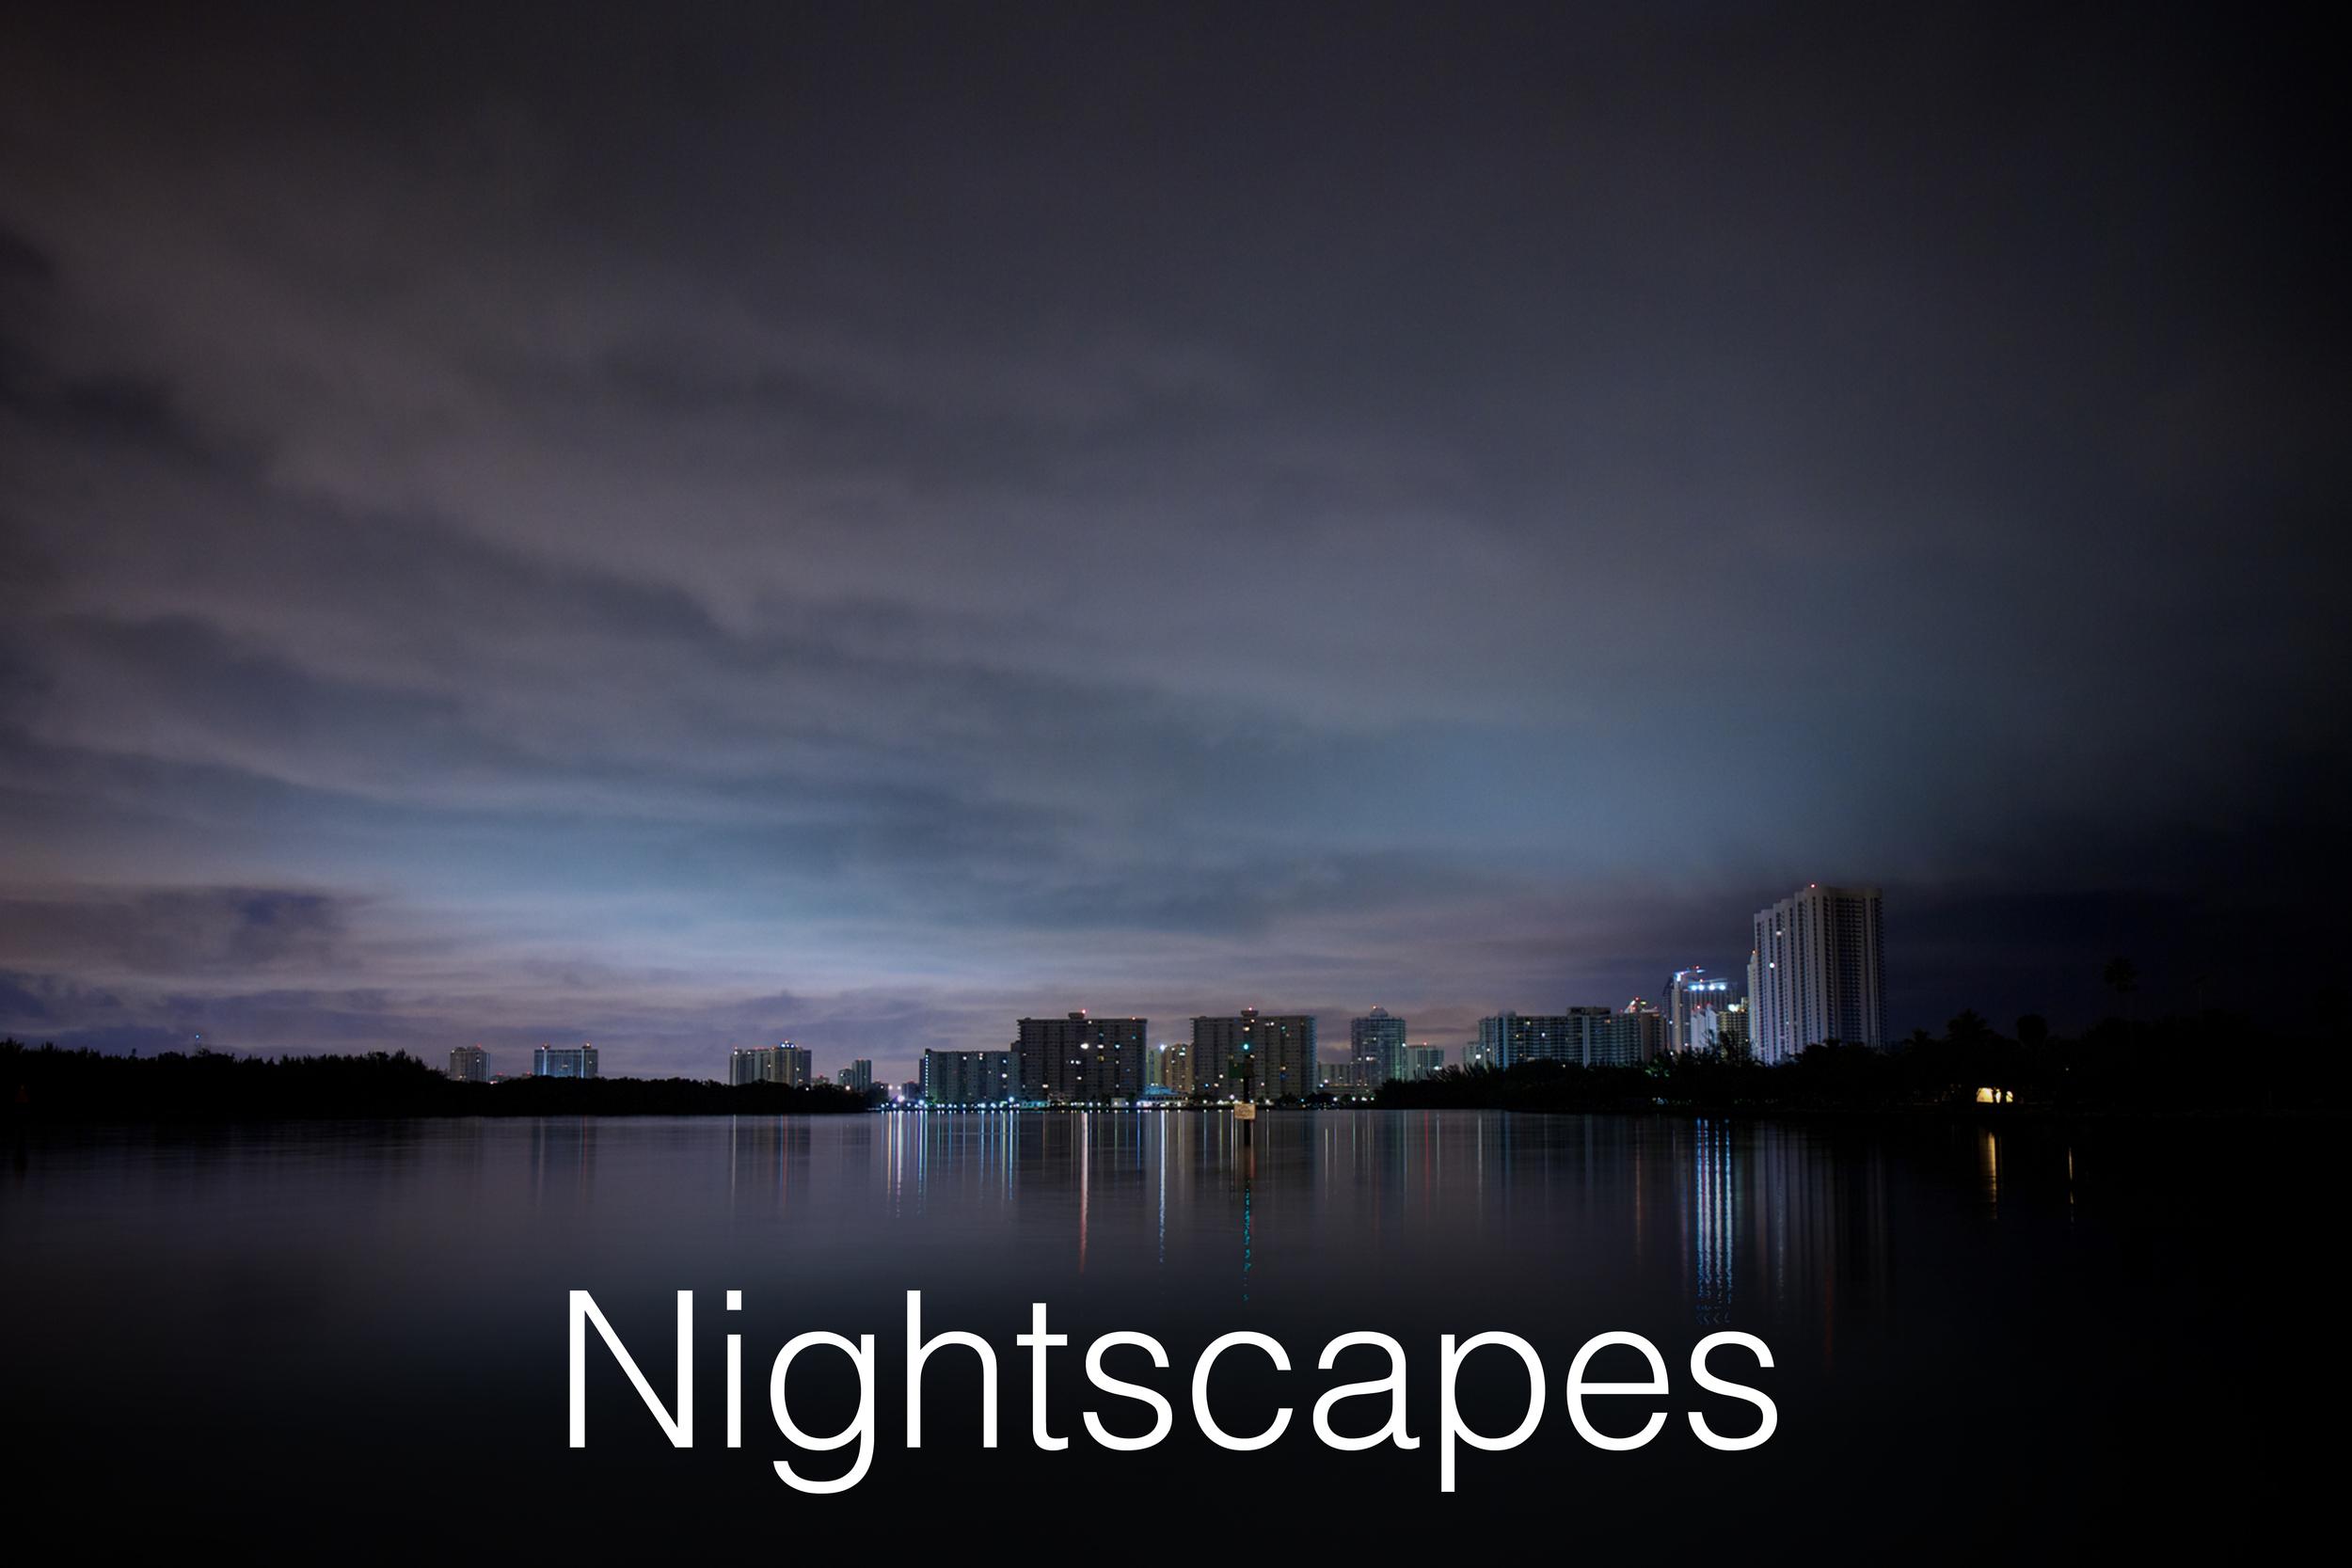 nightscapes.jpg